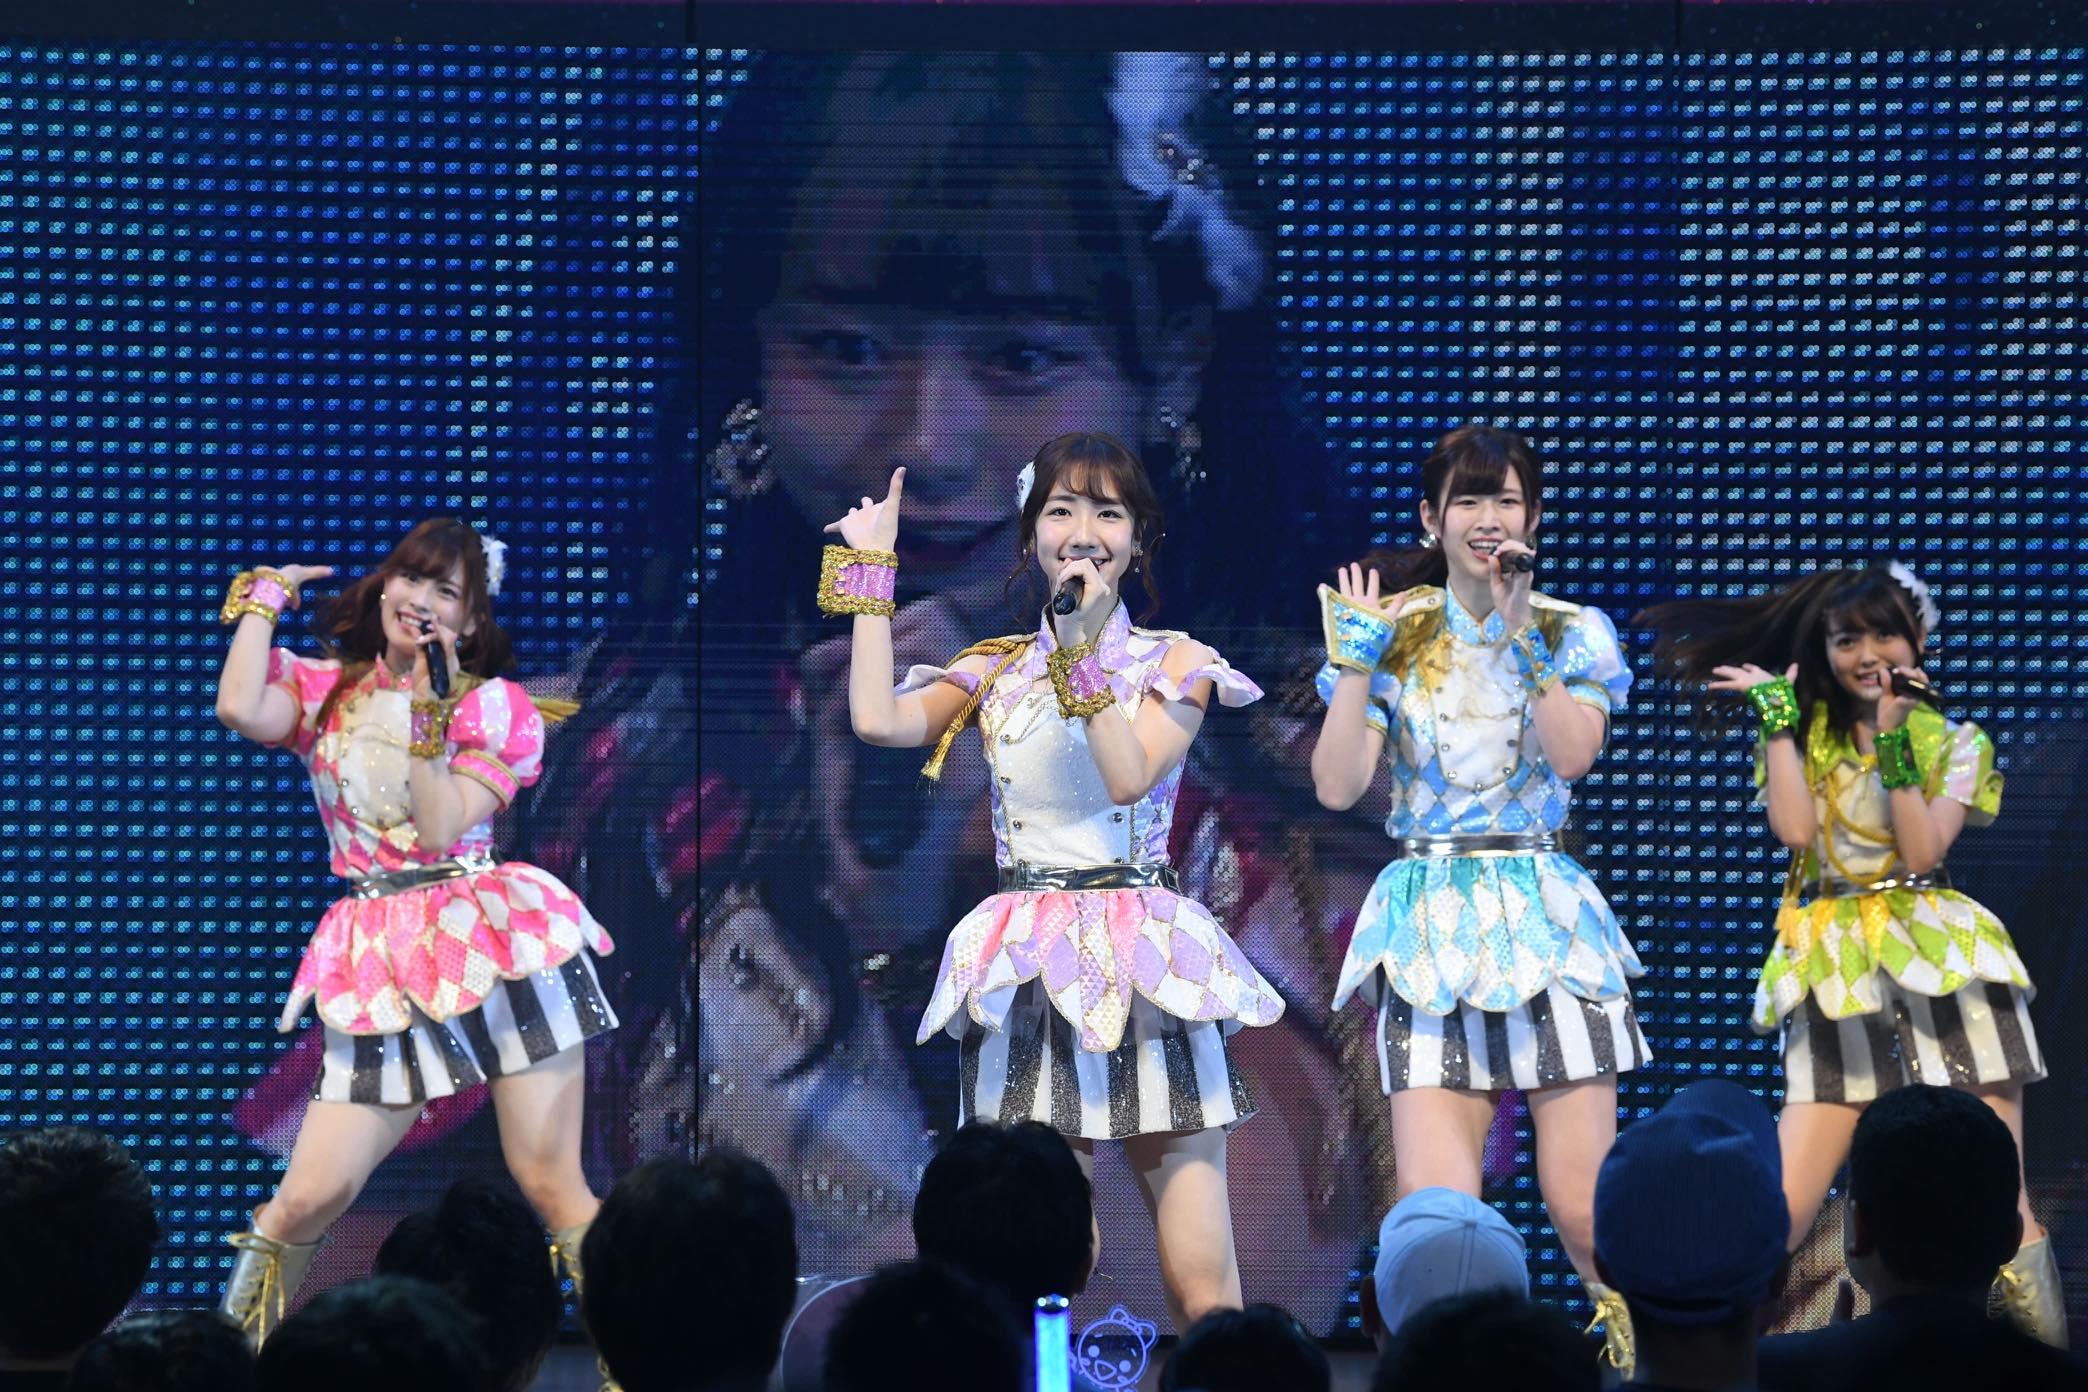 AKB48全国ツアー「神奈川公演」開催、チームBとチーム4のパワーが炸裂!【写真17枚】の画像001